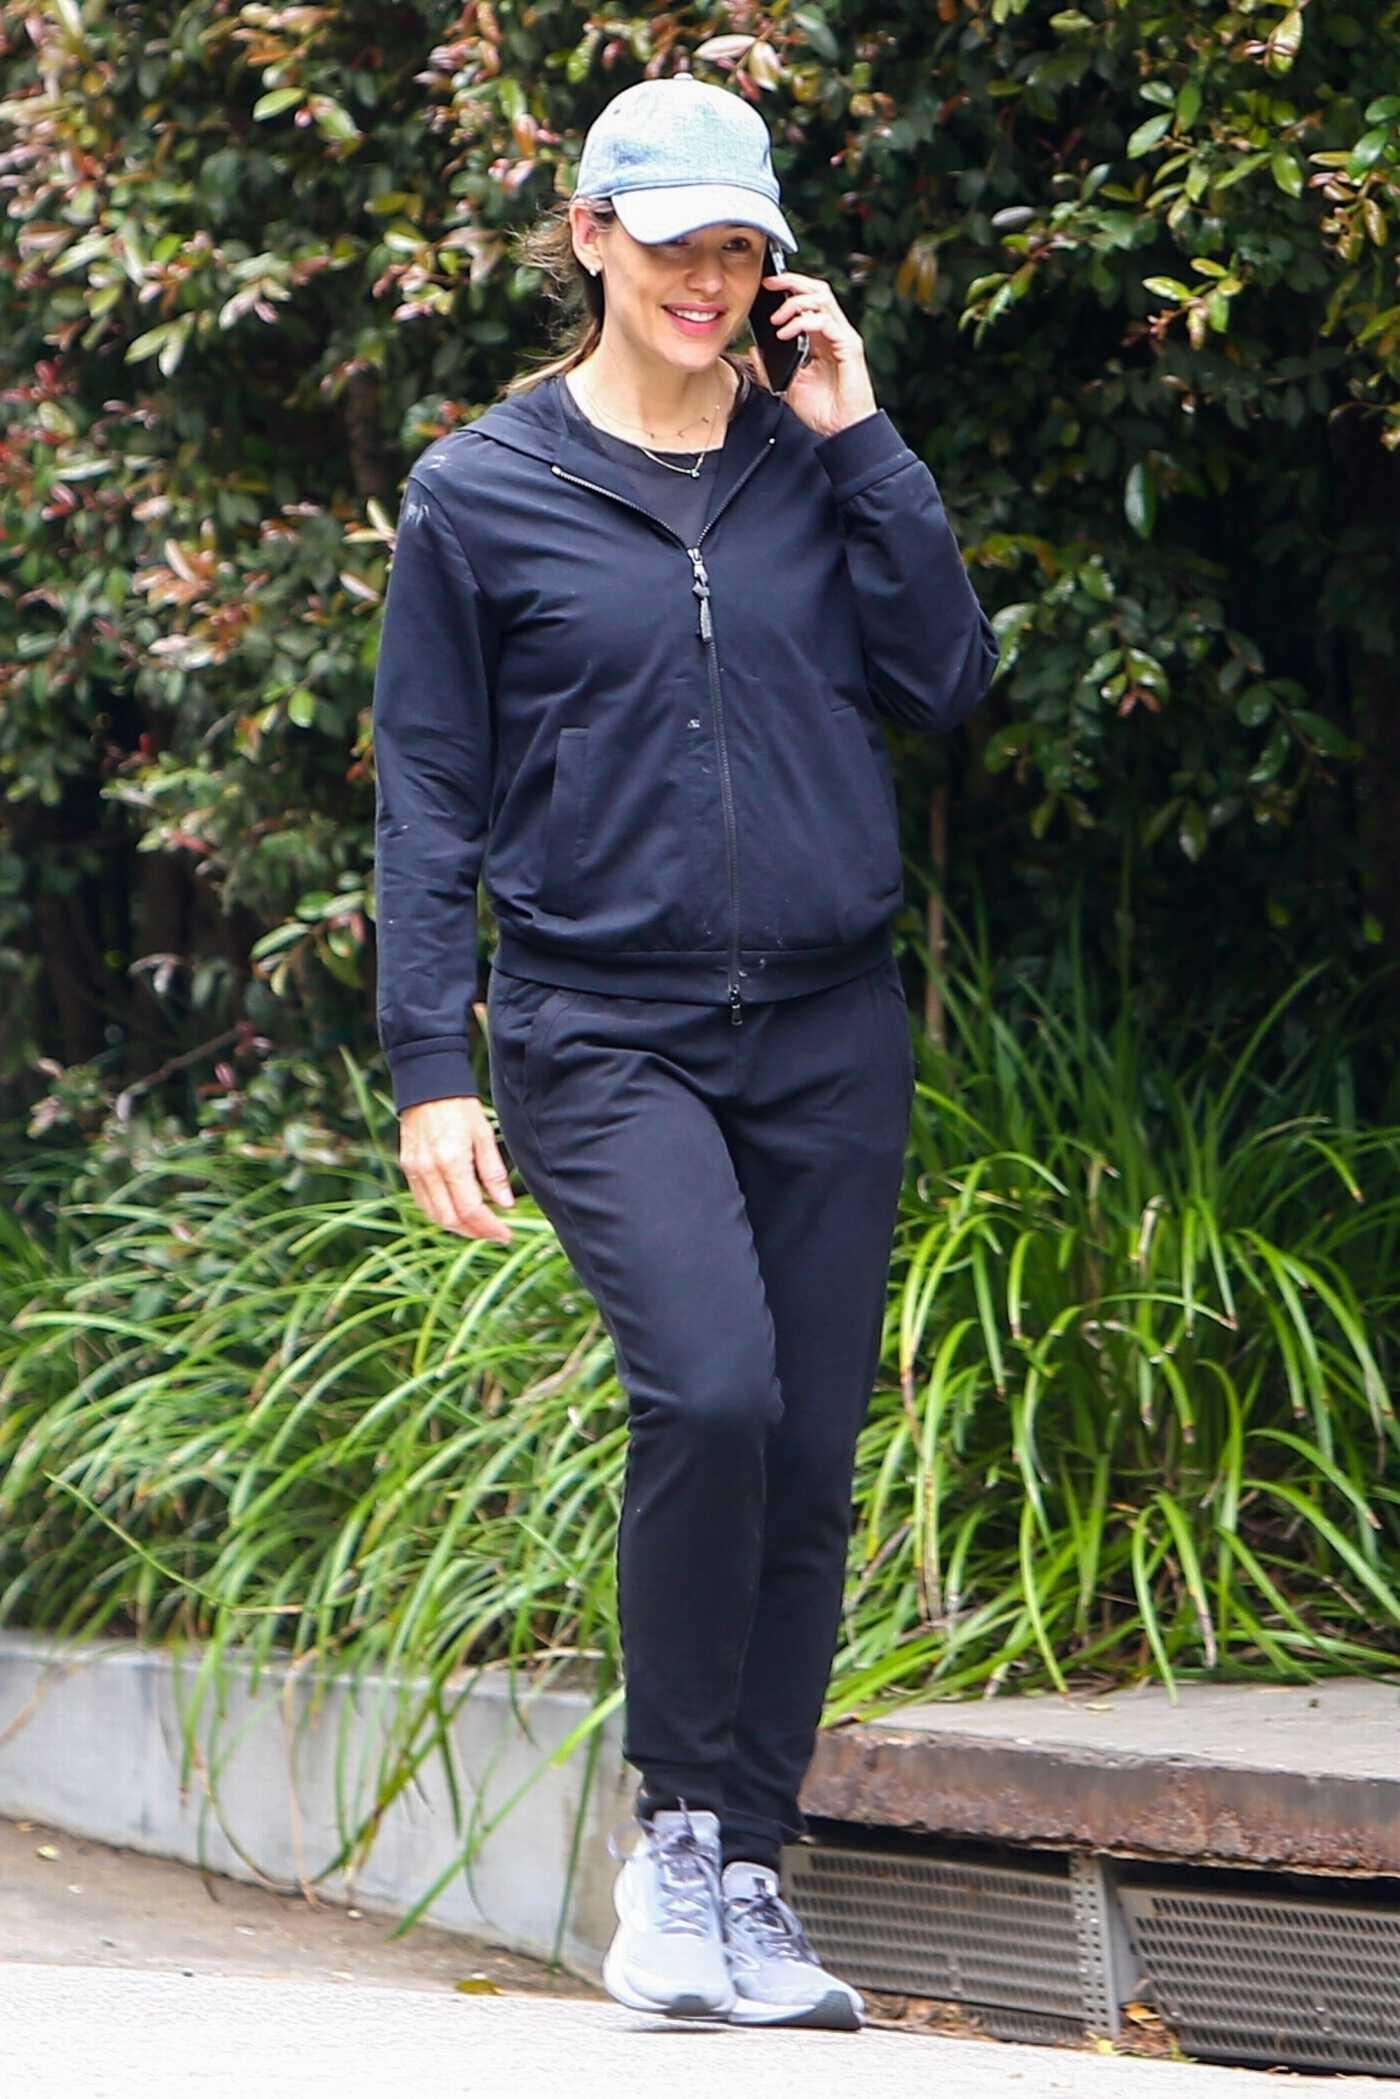 Jennifer Garner in a Black Tracksuit Goes on a Morning Walk Out in Brentwood 05/15/2021